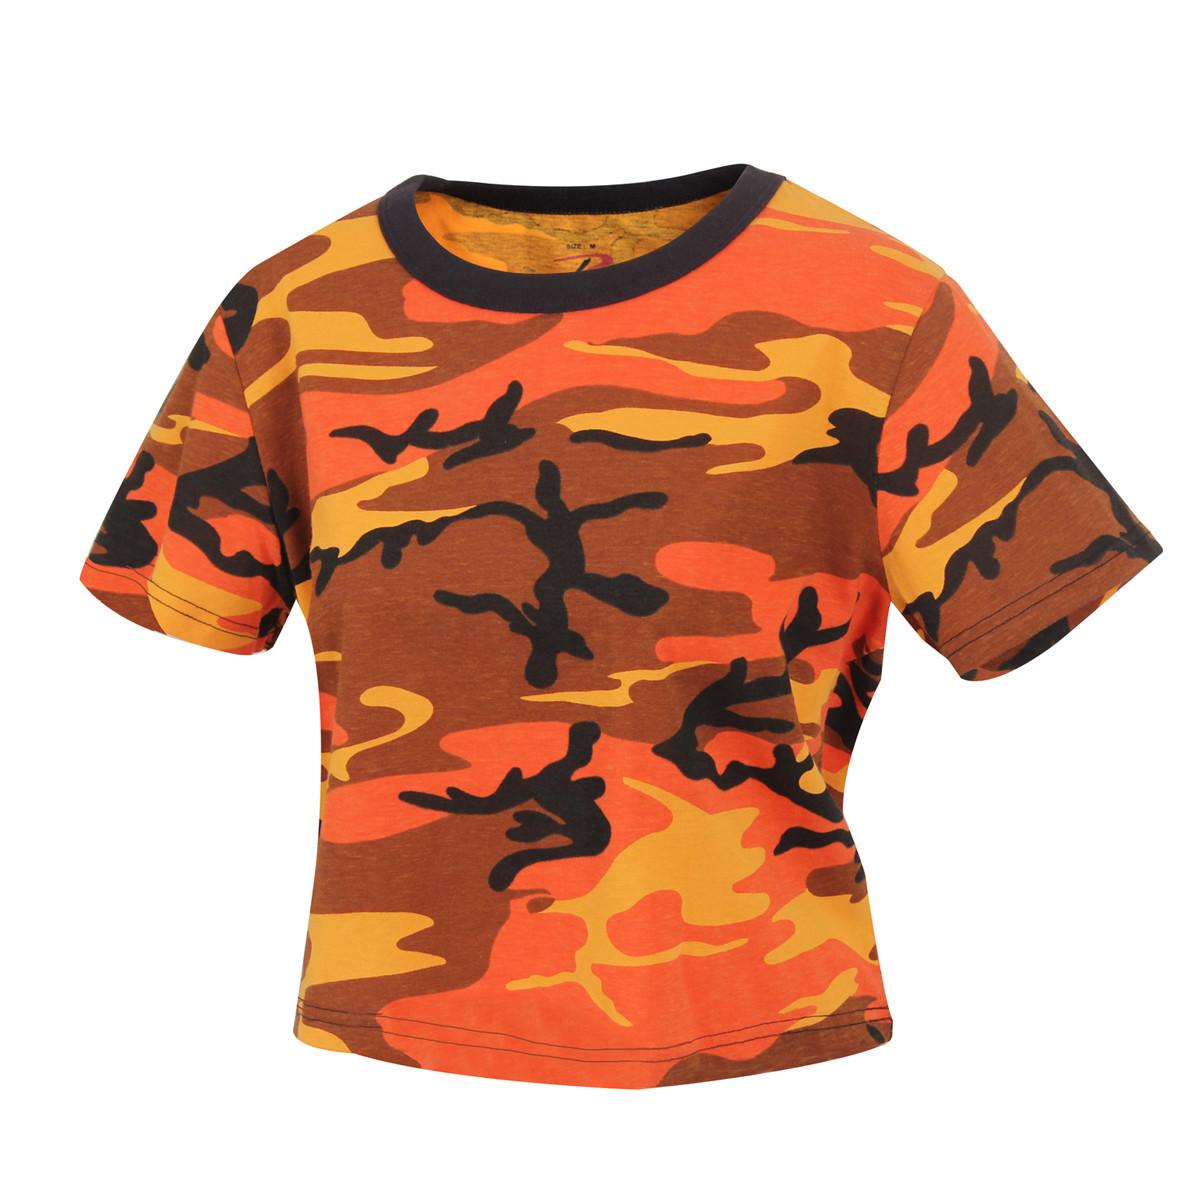 37e5331fa283c0 Shop Womens Crop Orange Camo T s - Fatigues Army Navy Gear